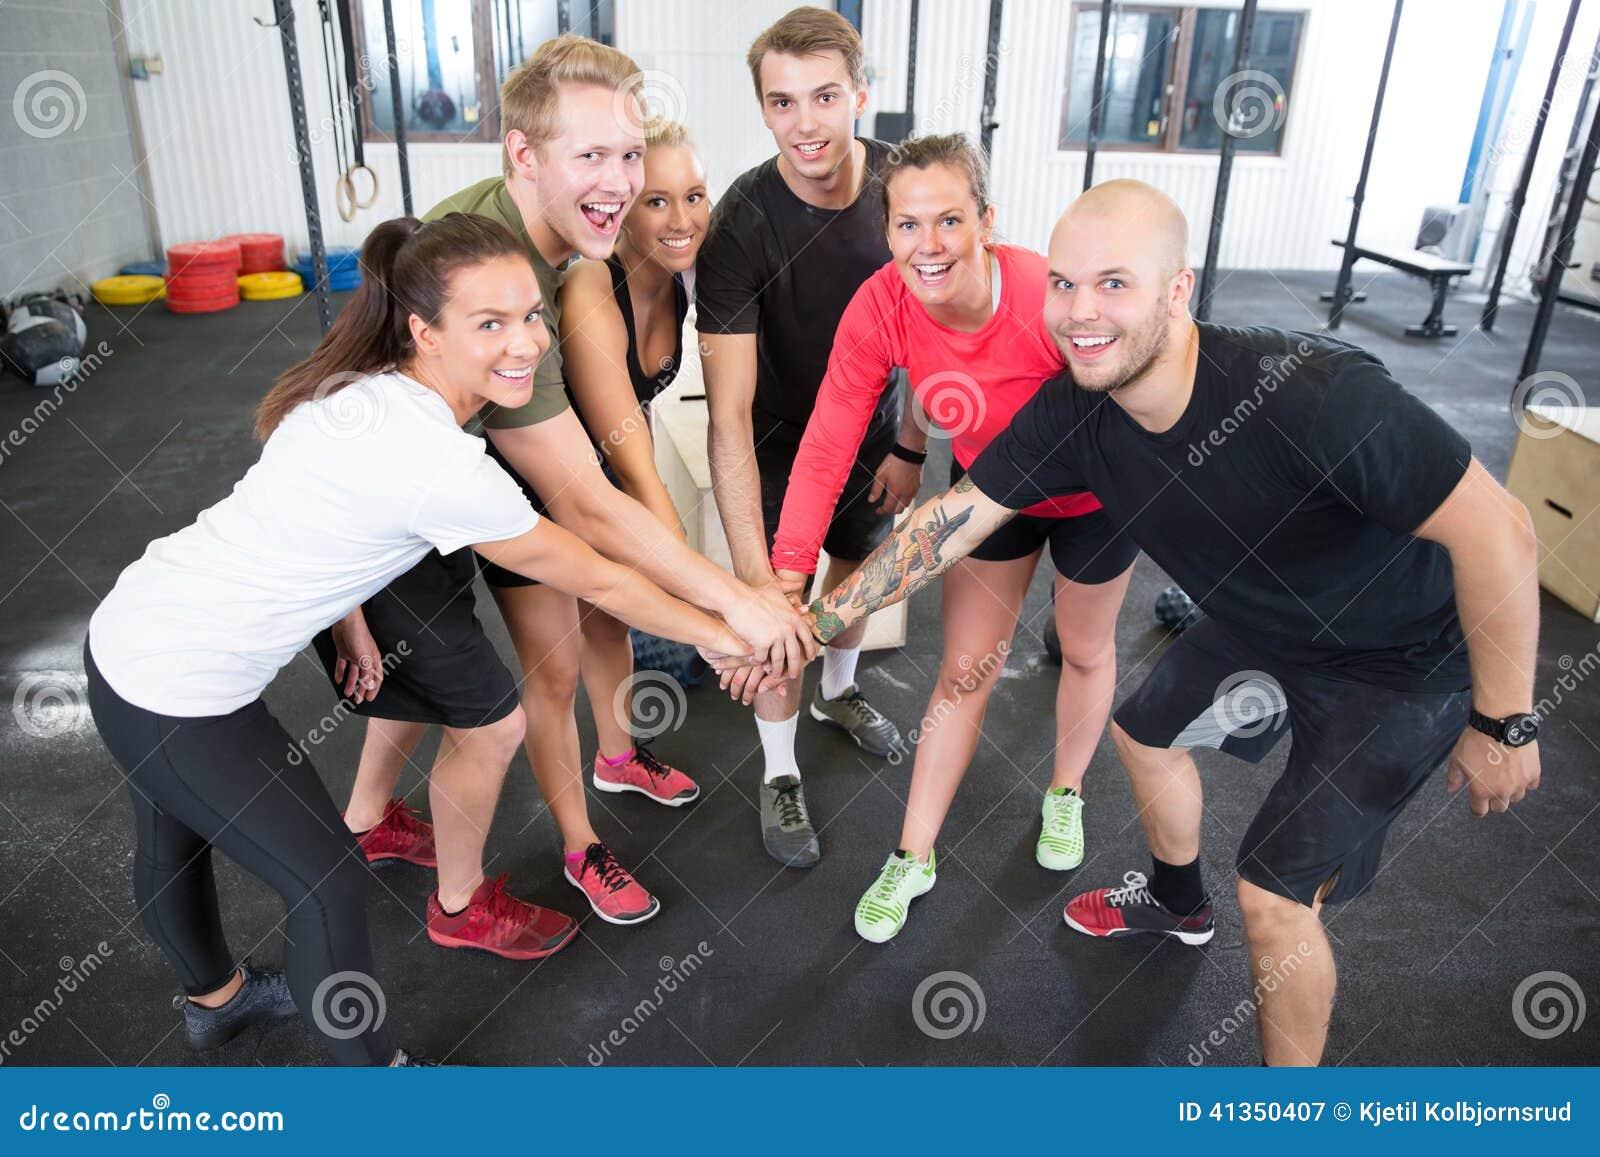 Crossfit workout team motivation